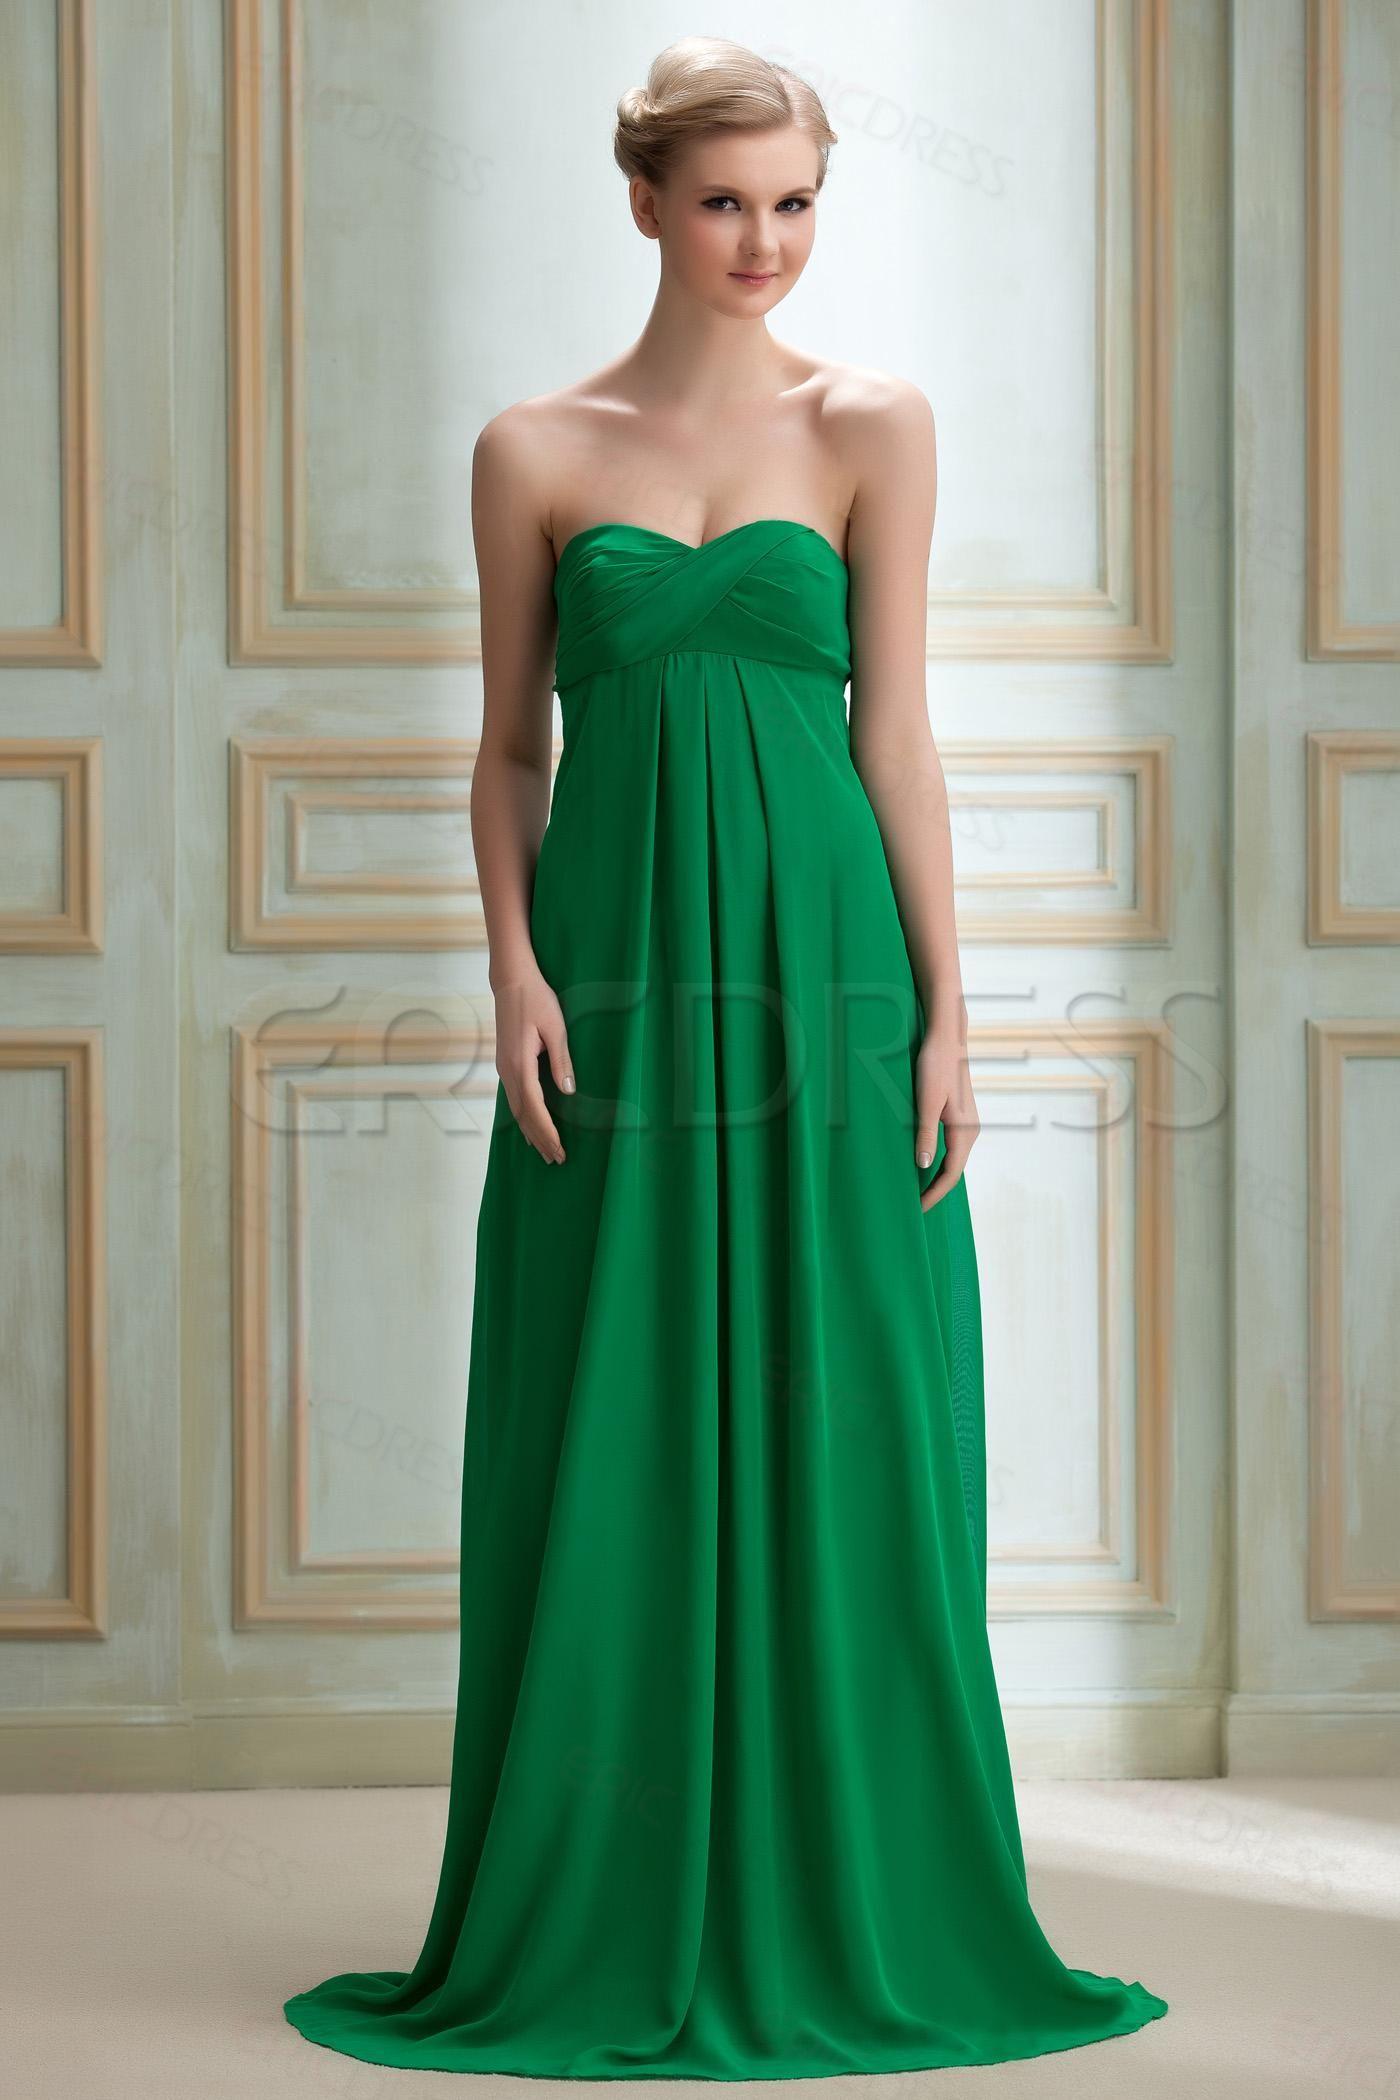 Hot Elegant A-line Strapless Floor-length Yanas Prom Dress | Probs ...